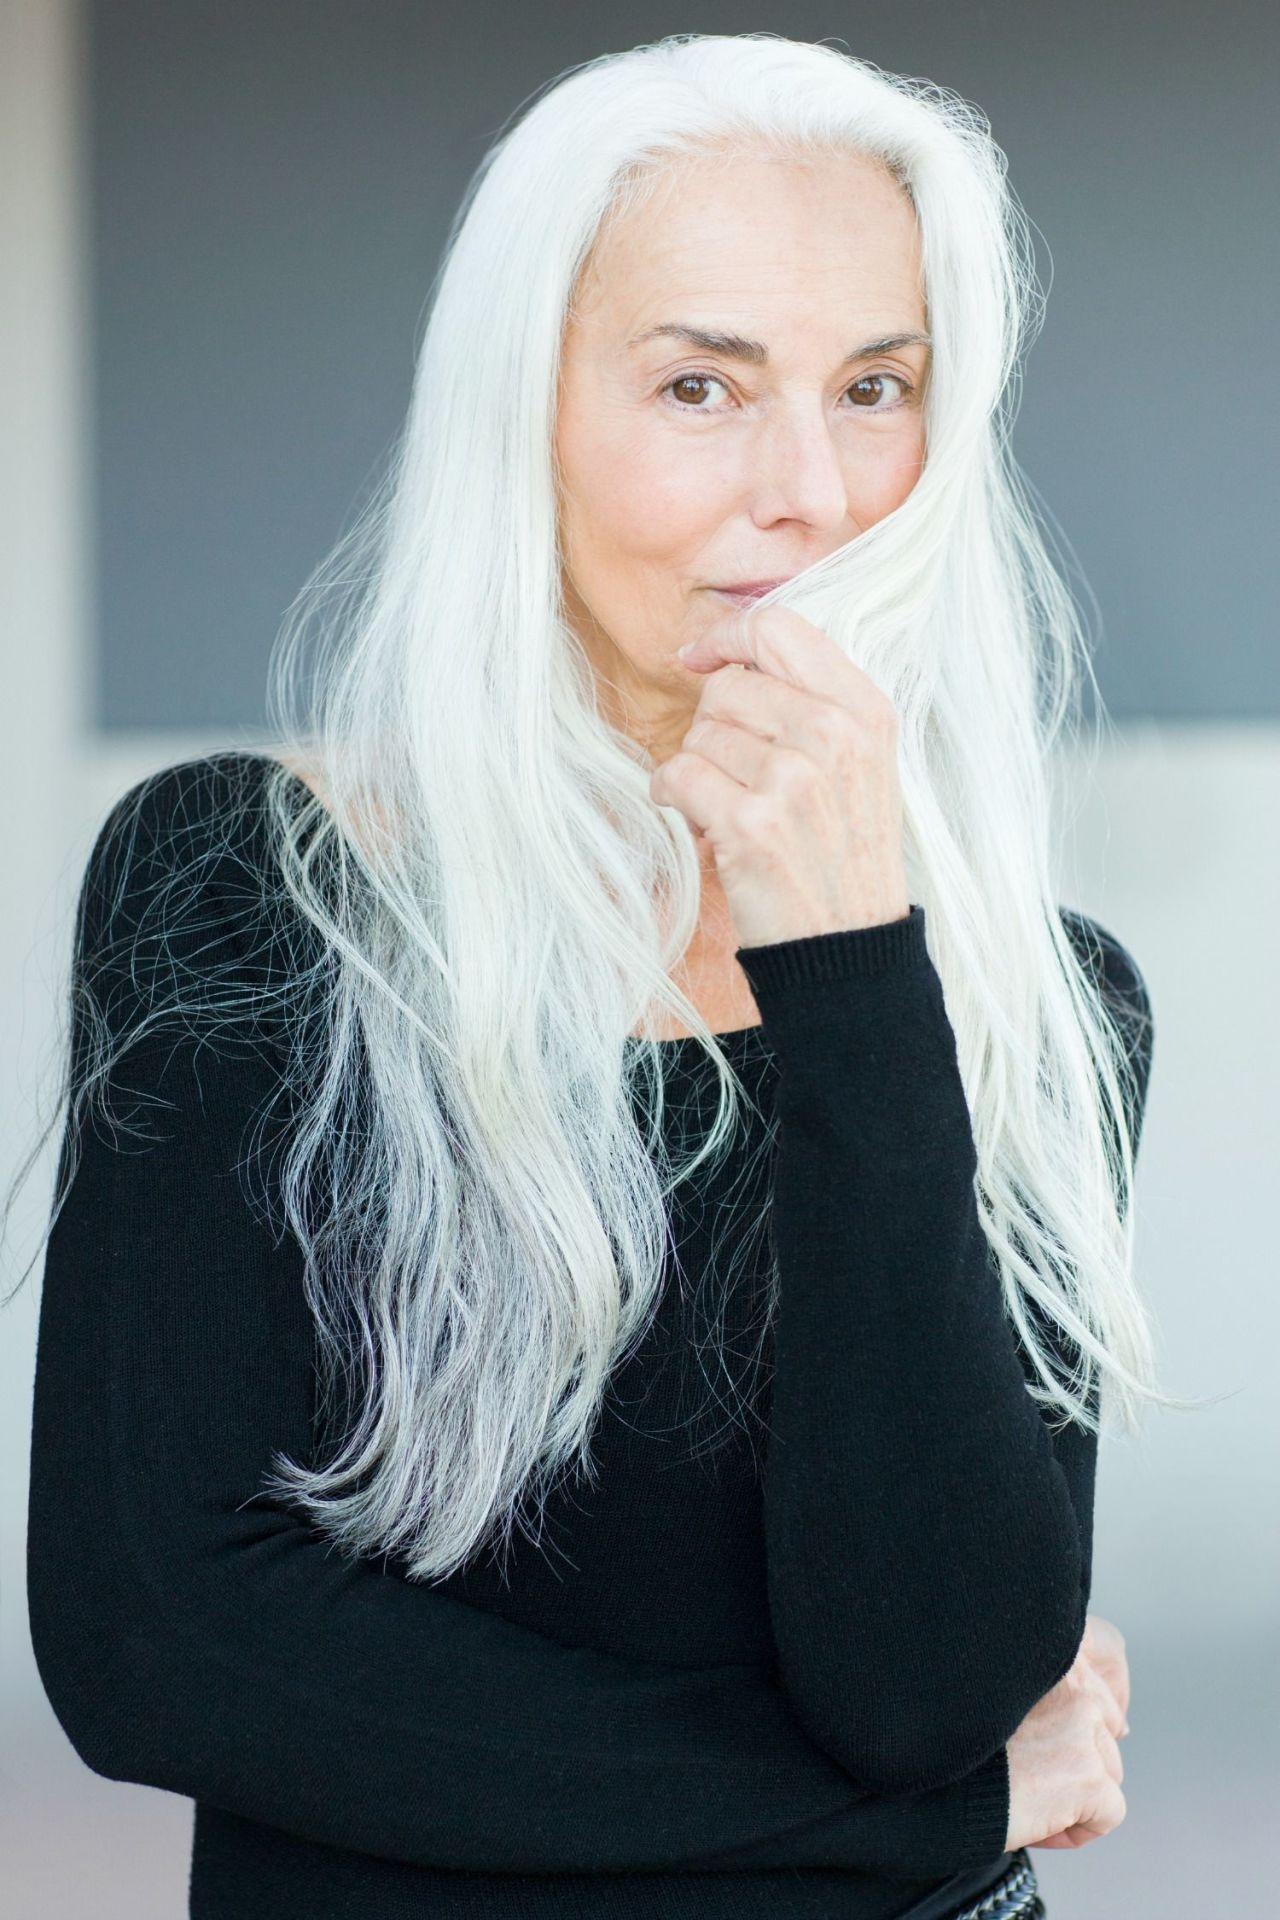 French model Yasmina Rossi: biography, career, personal life 85